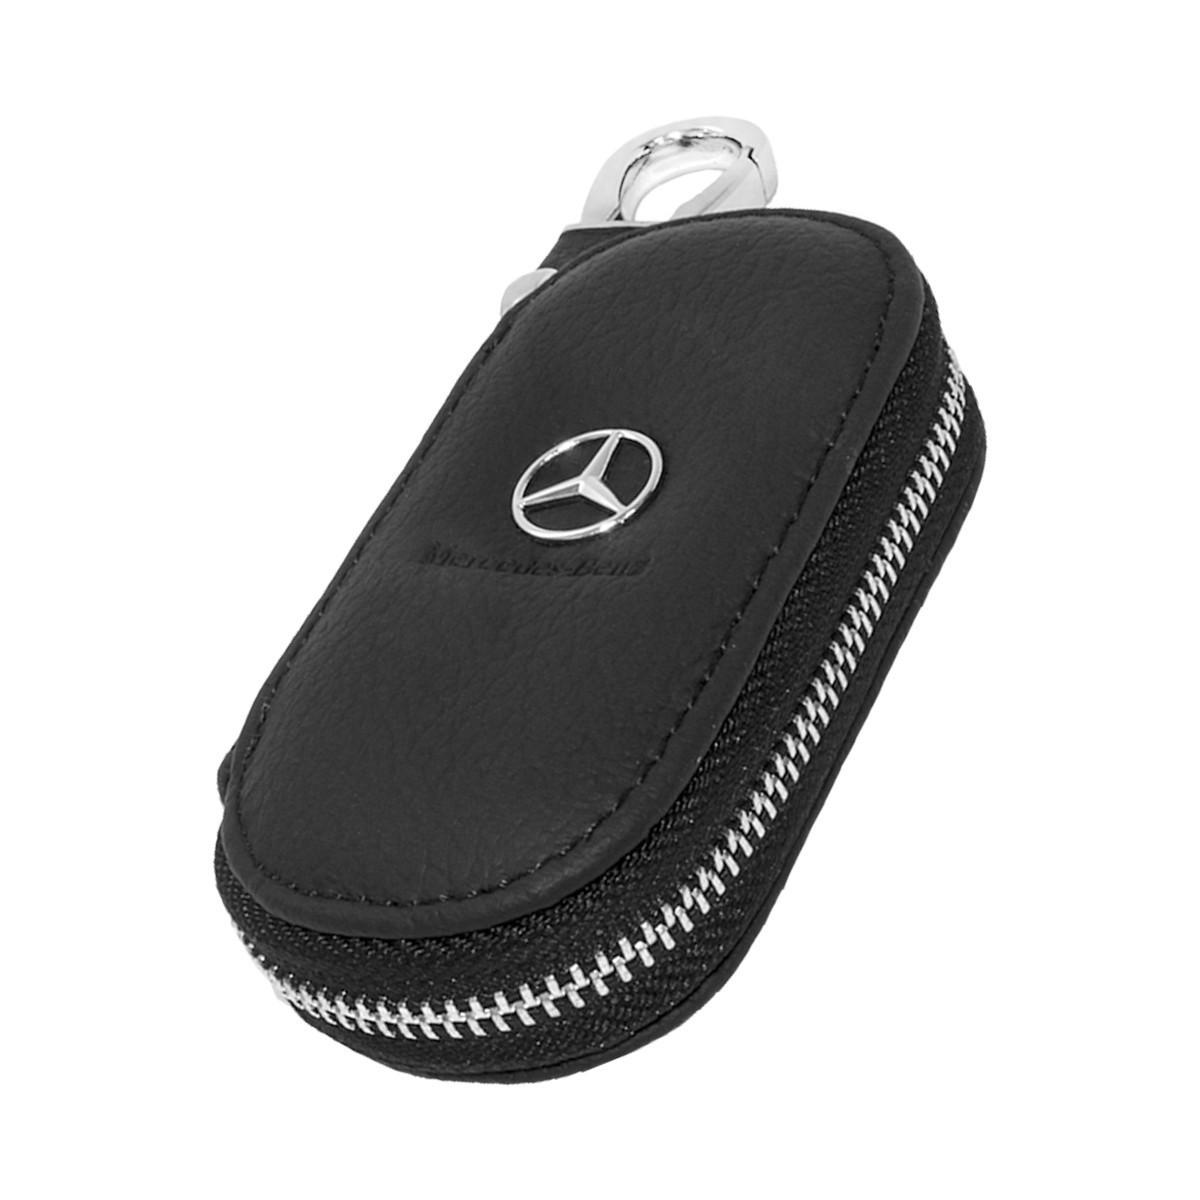 Ключница Carss с логотипом MERCEDES 02003 черная